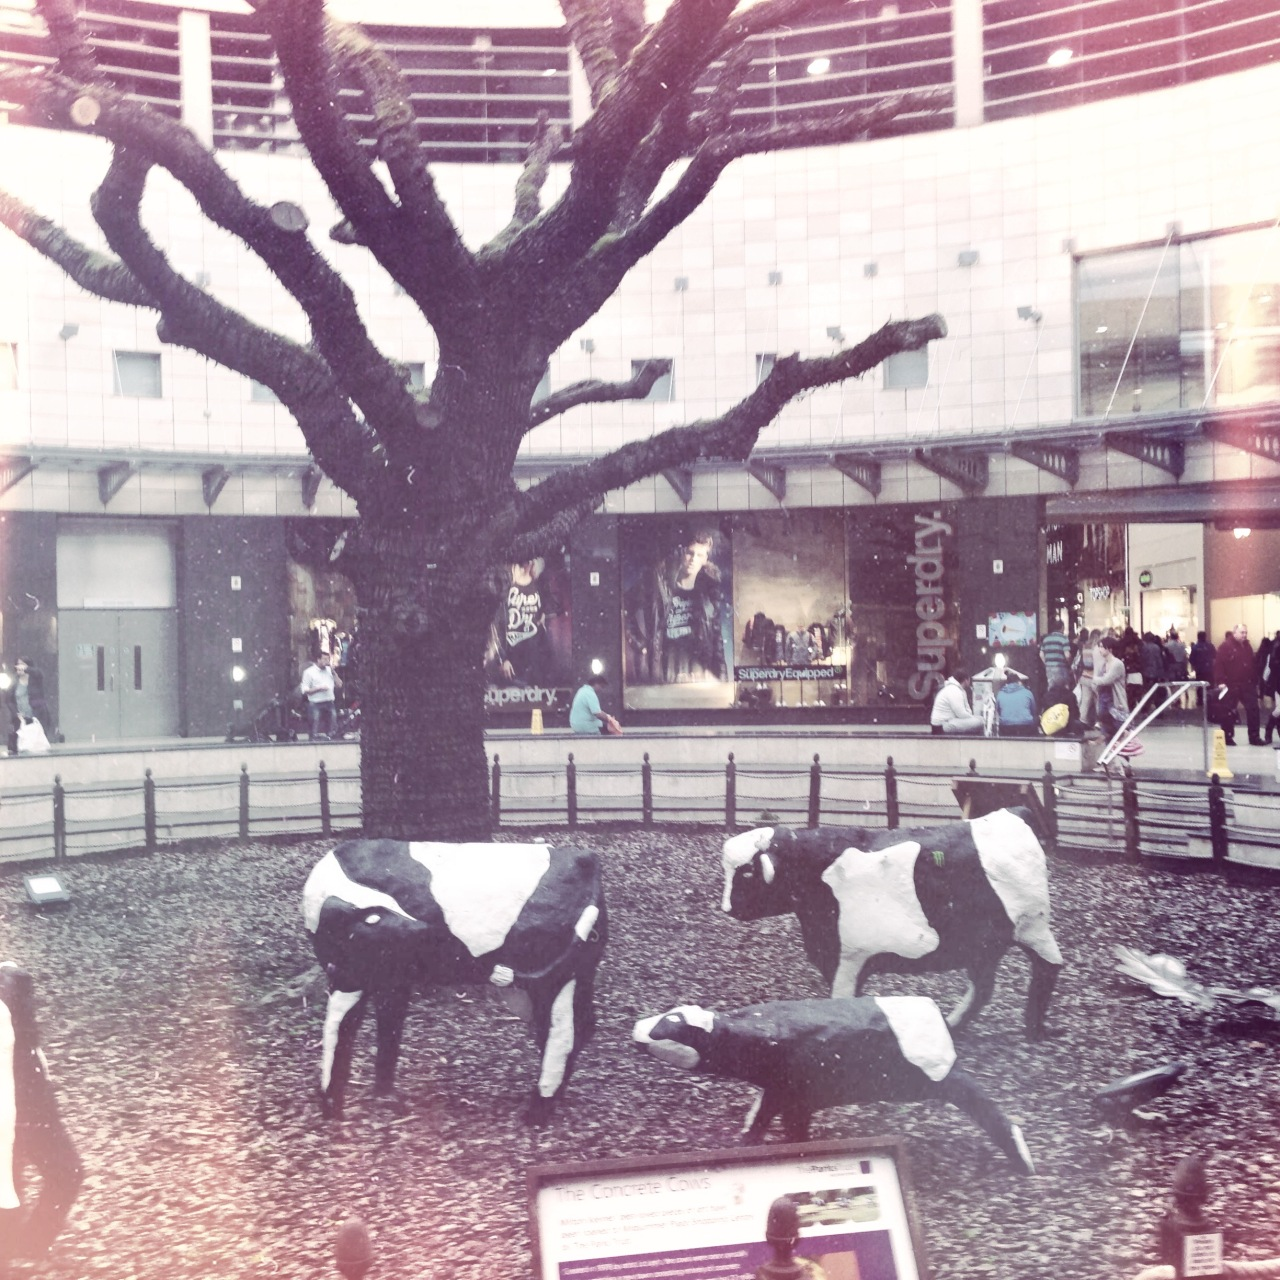 The Cows of Milton Keynes